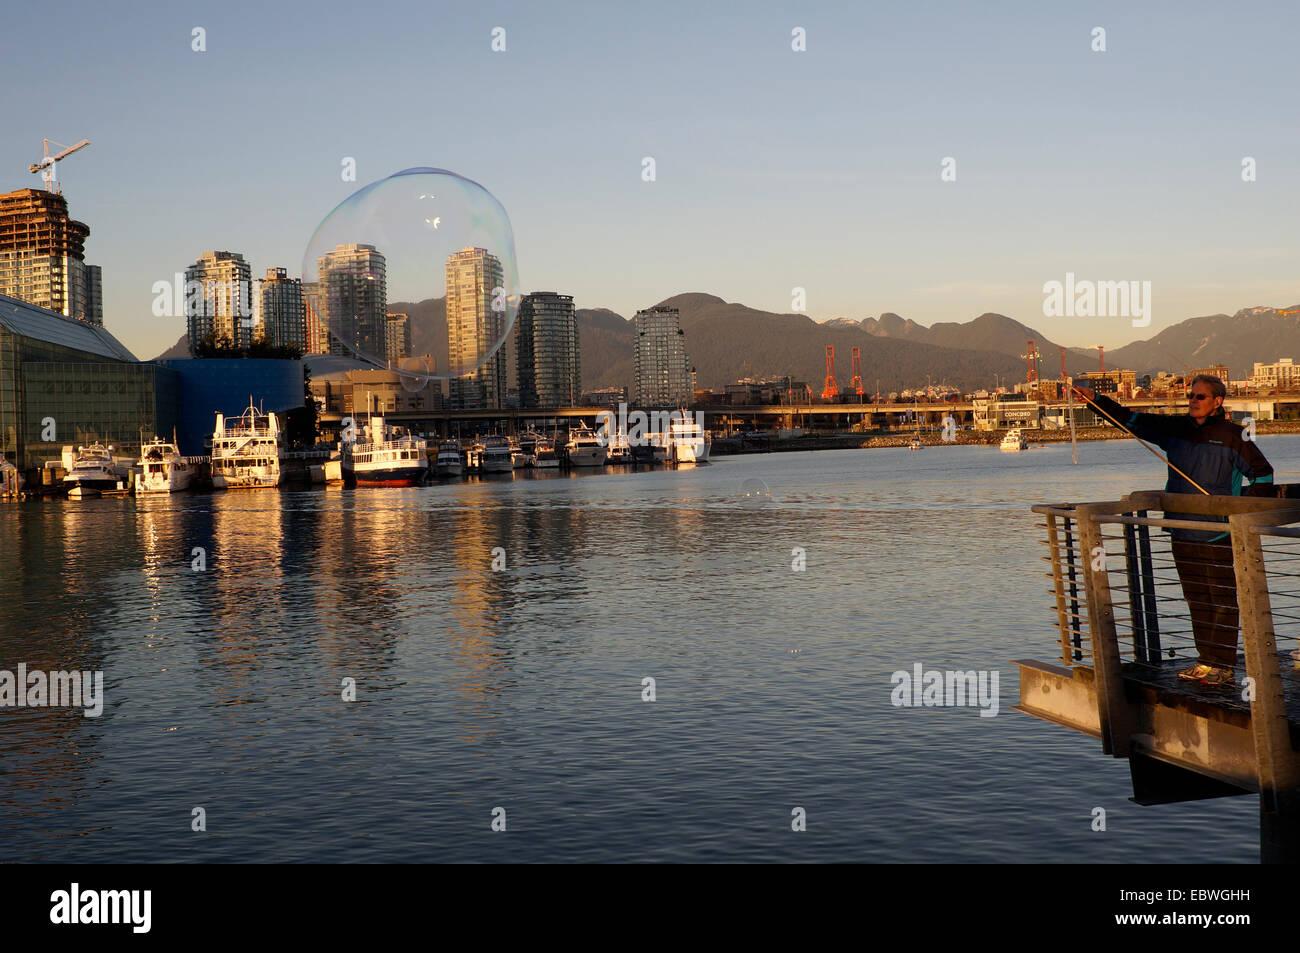 Man making giant soap bubbles, False Creek, Vancouver, British Columbia, Canada - Stock Image